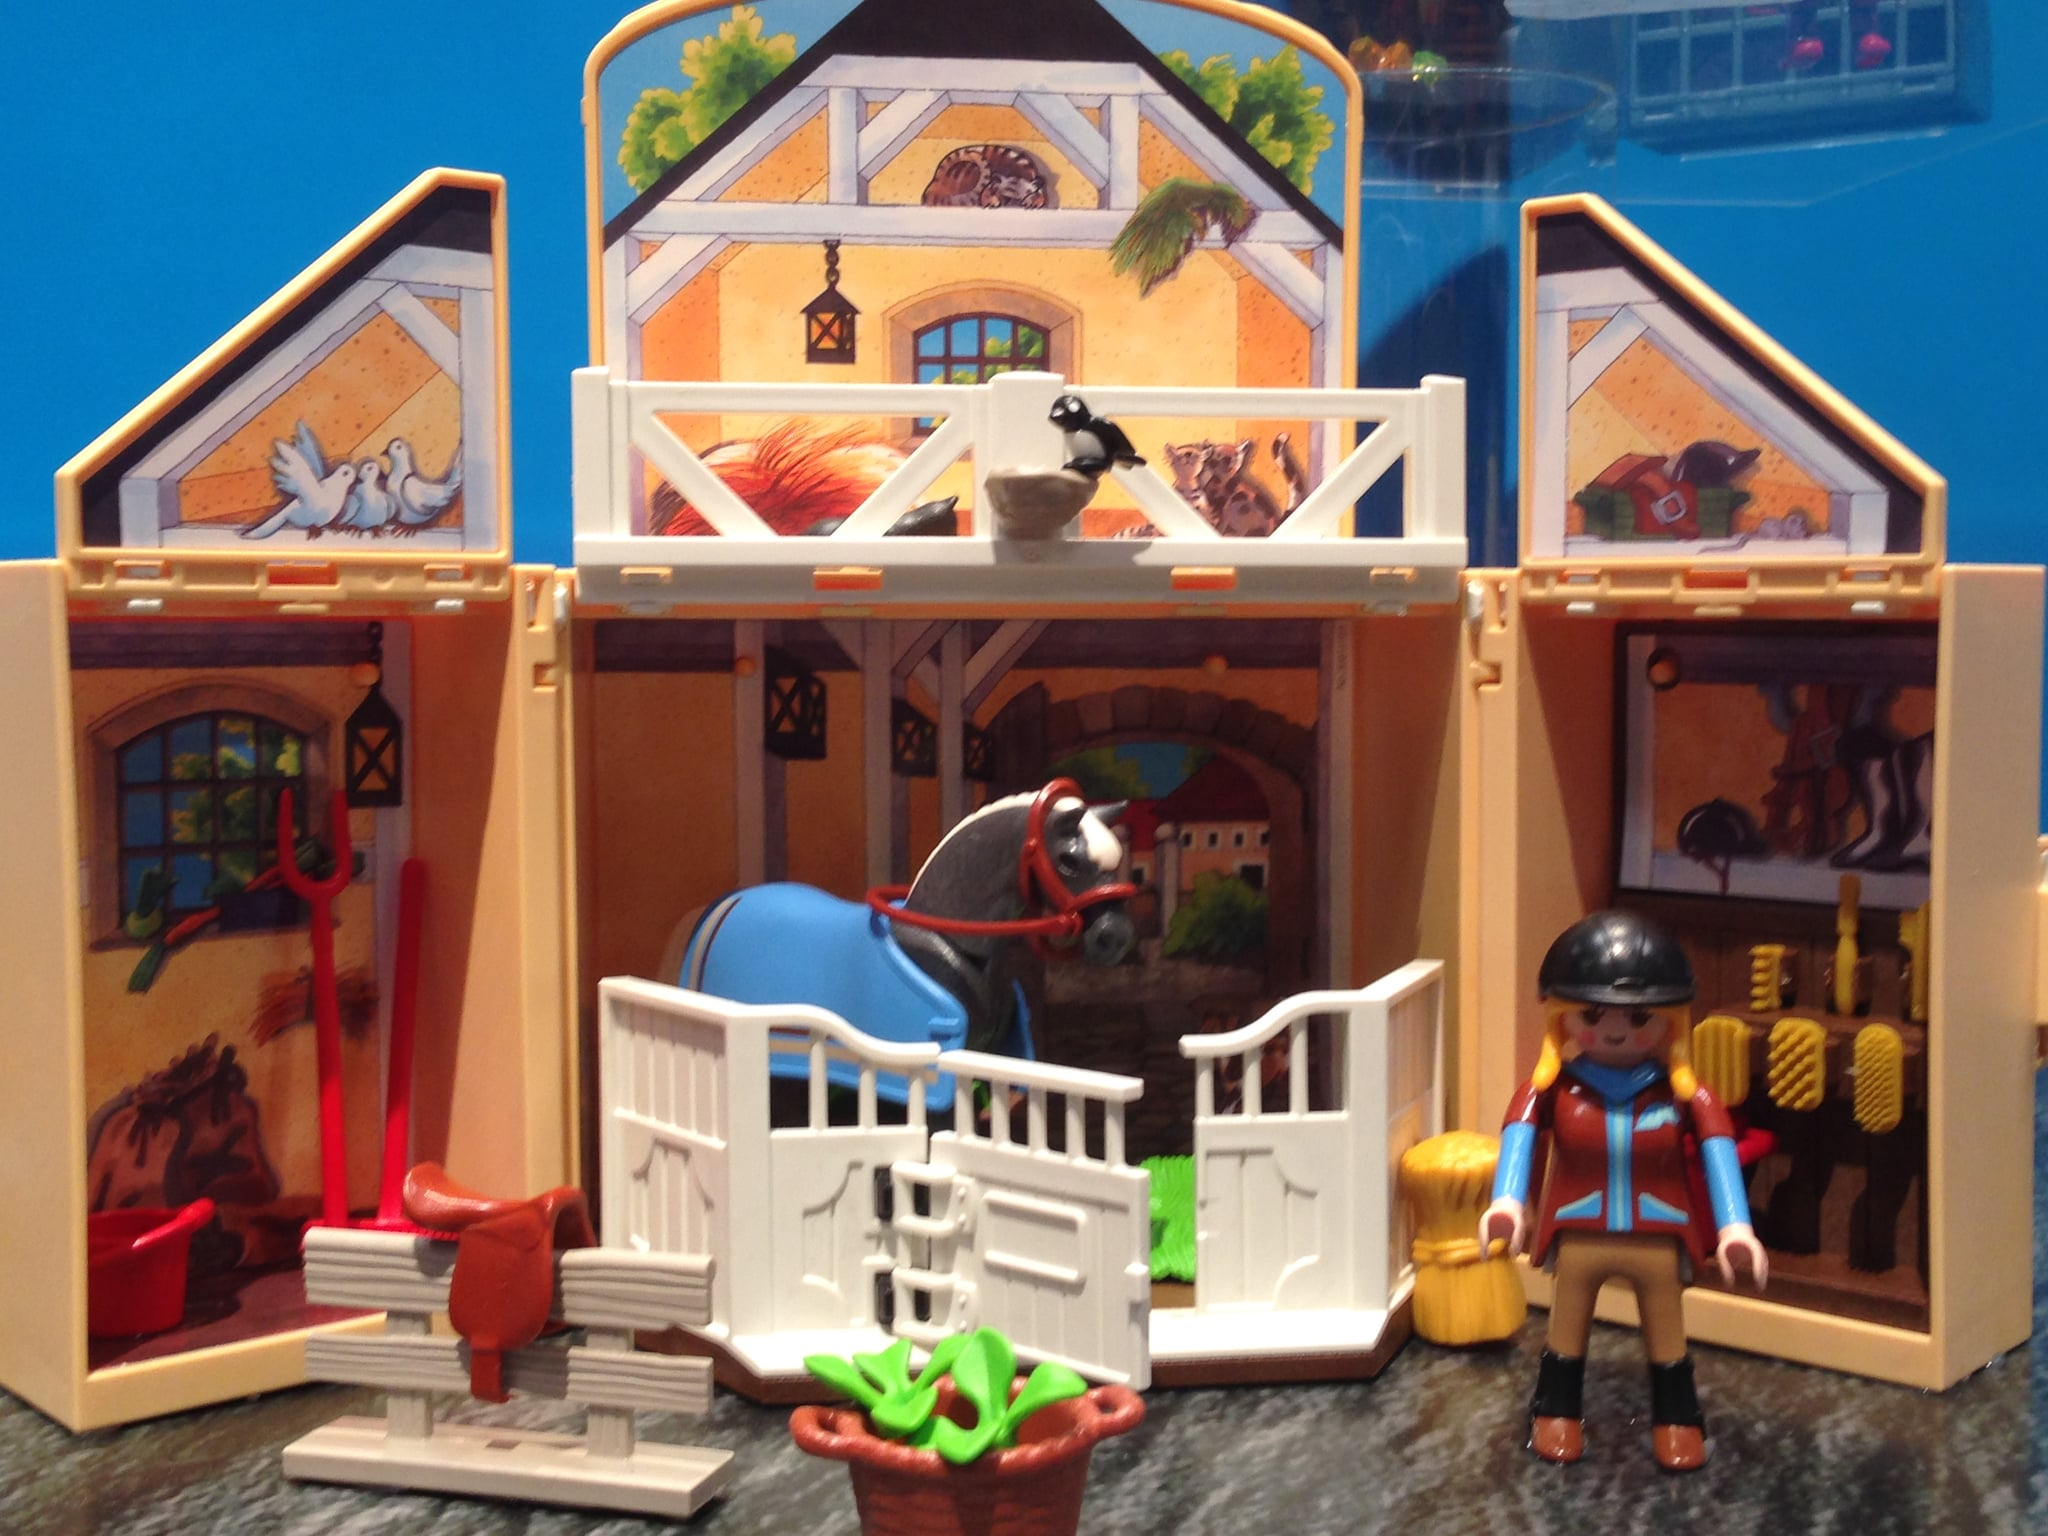 Playmobil My Secret Play Box